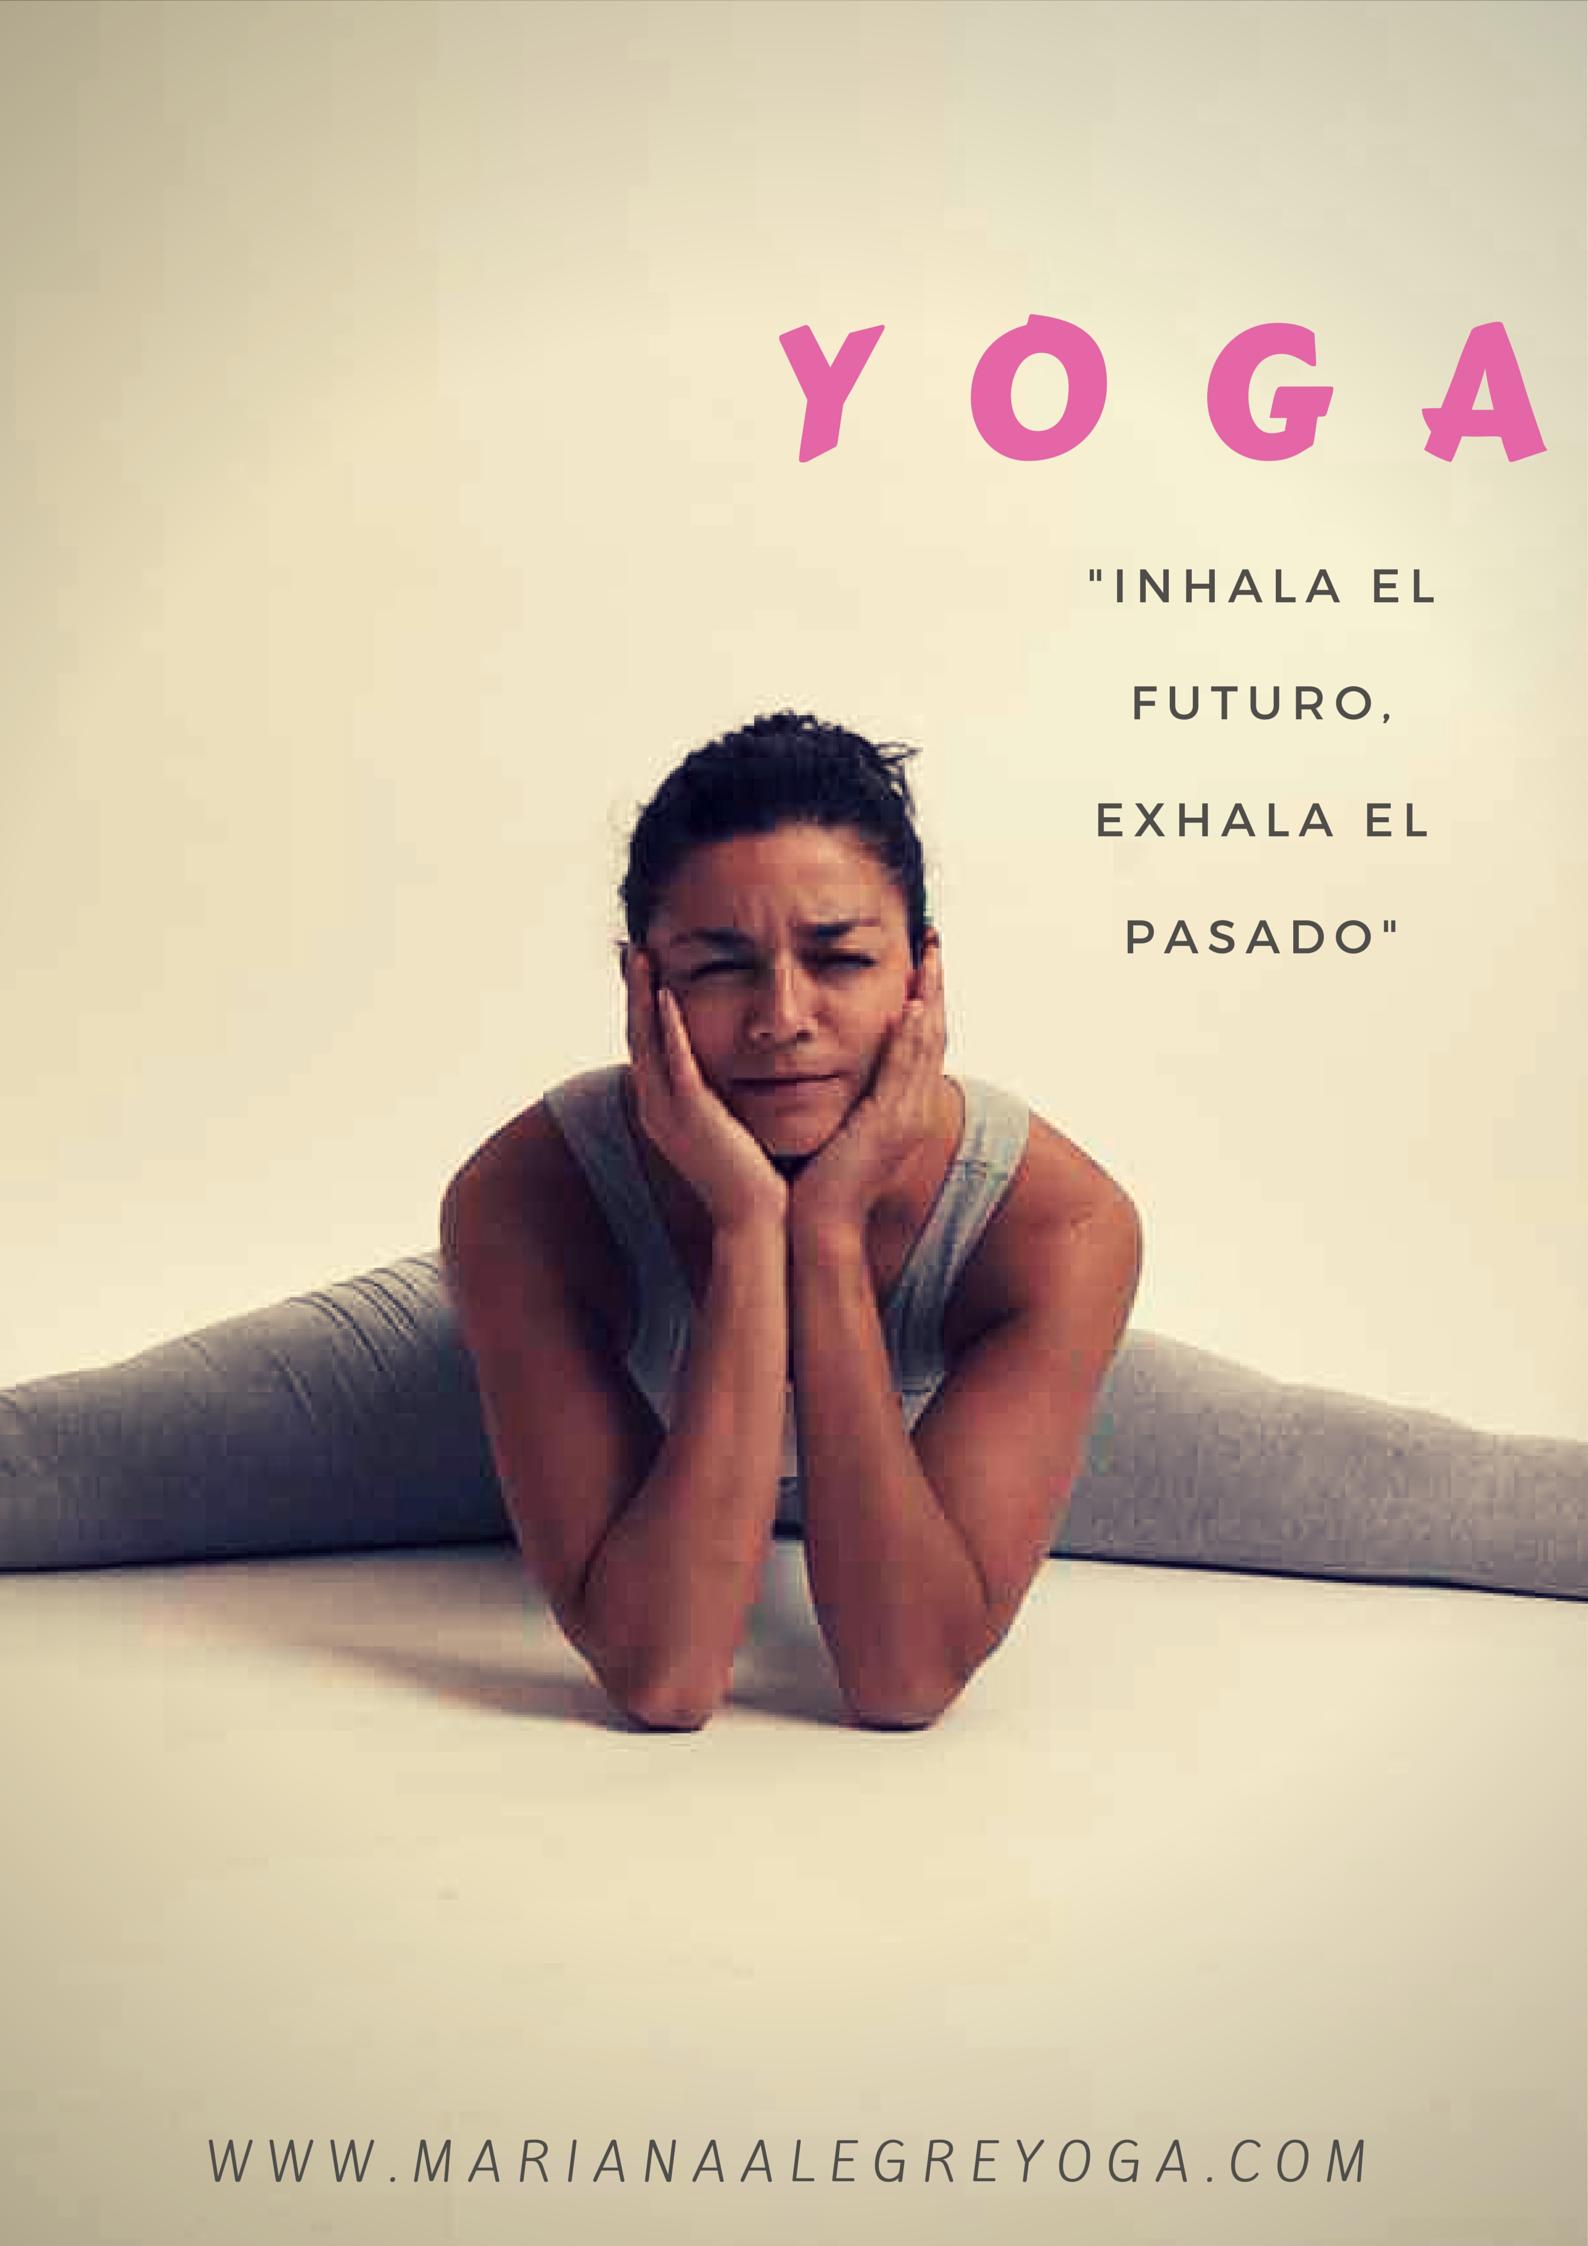 #Perspectivas #yoga #pasado #futuro www.marianaalegreyoga.com/perspectivas/  | MarianaAlegreYoga